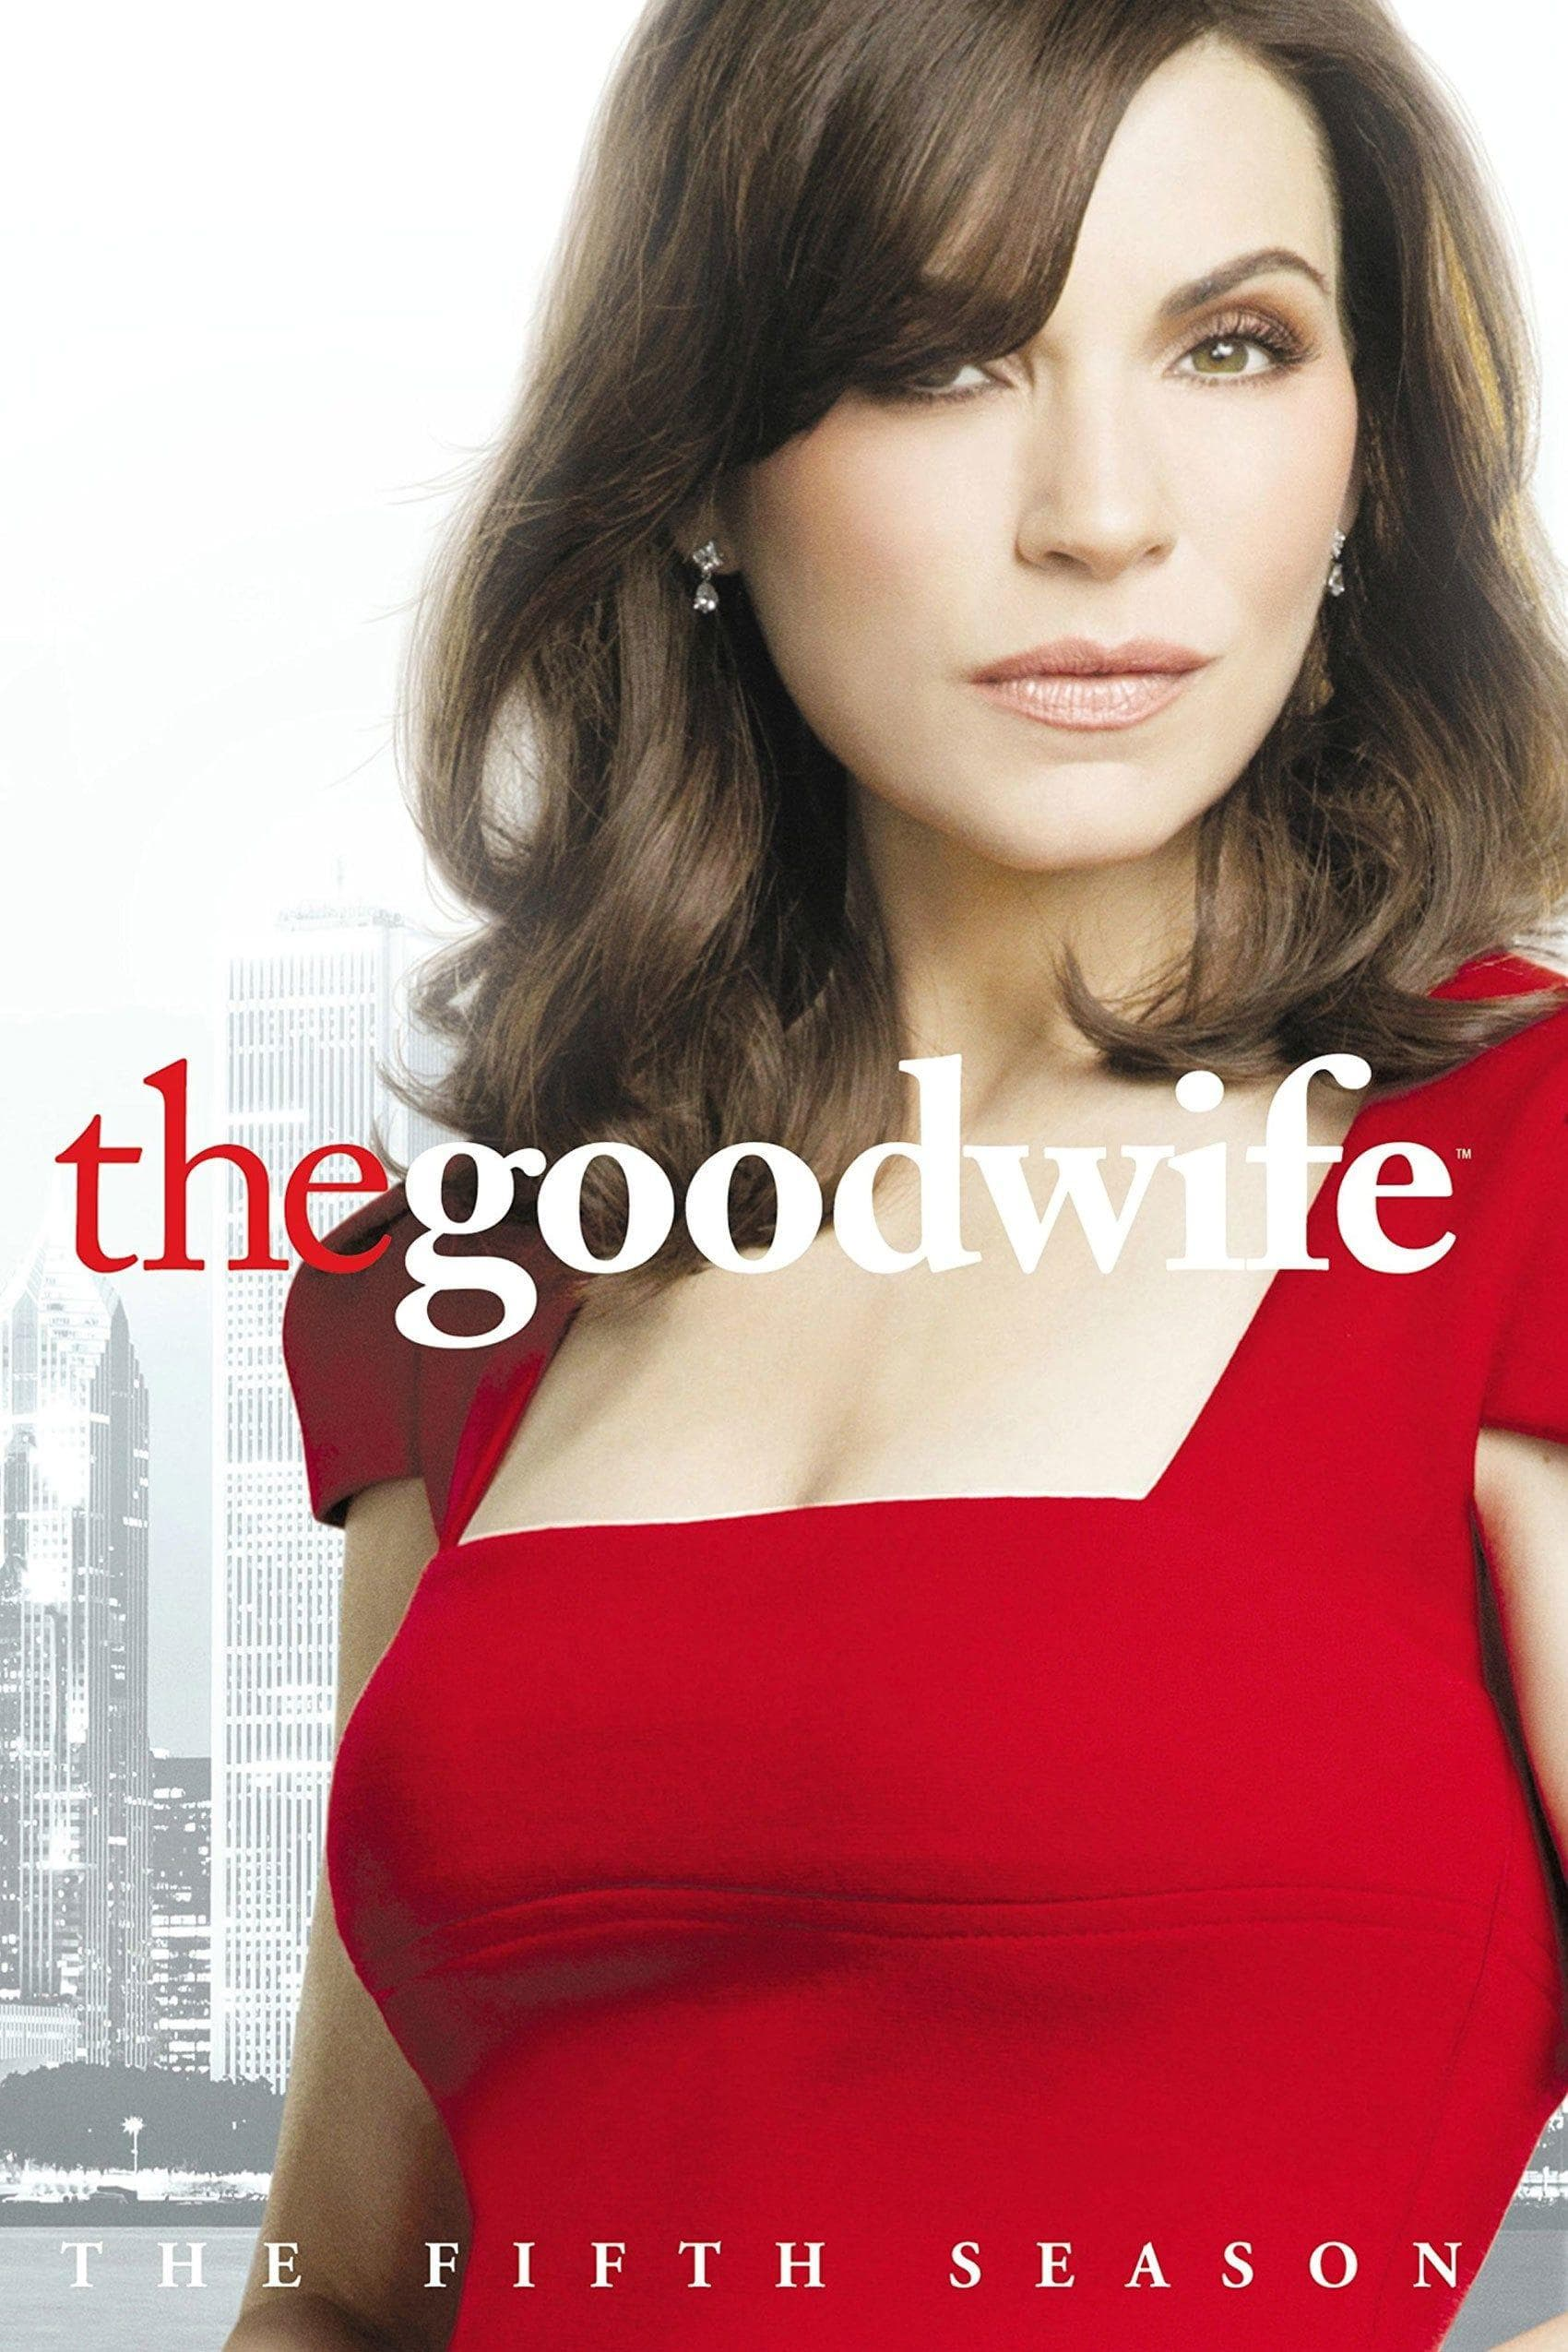 Random Best Seasons of The Good Wife Thumb Image